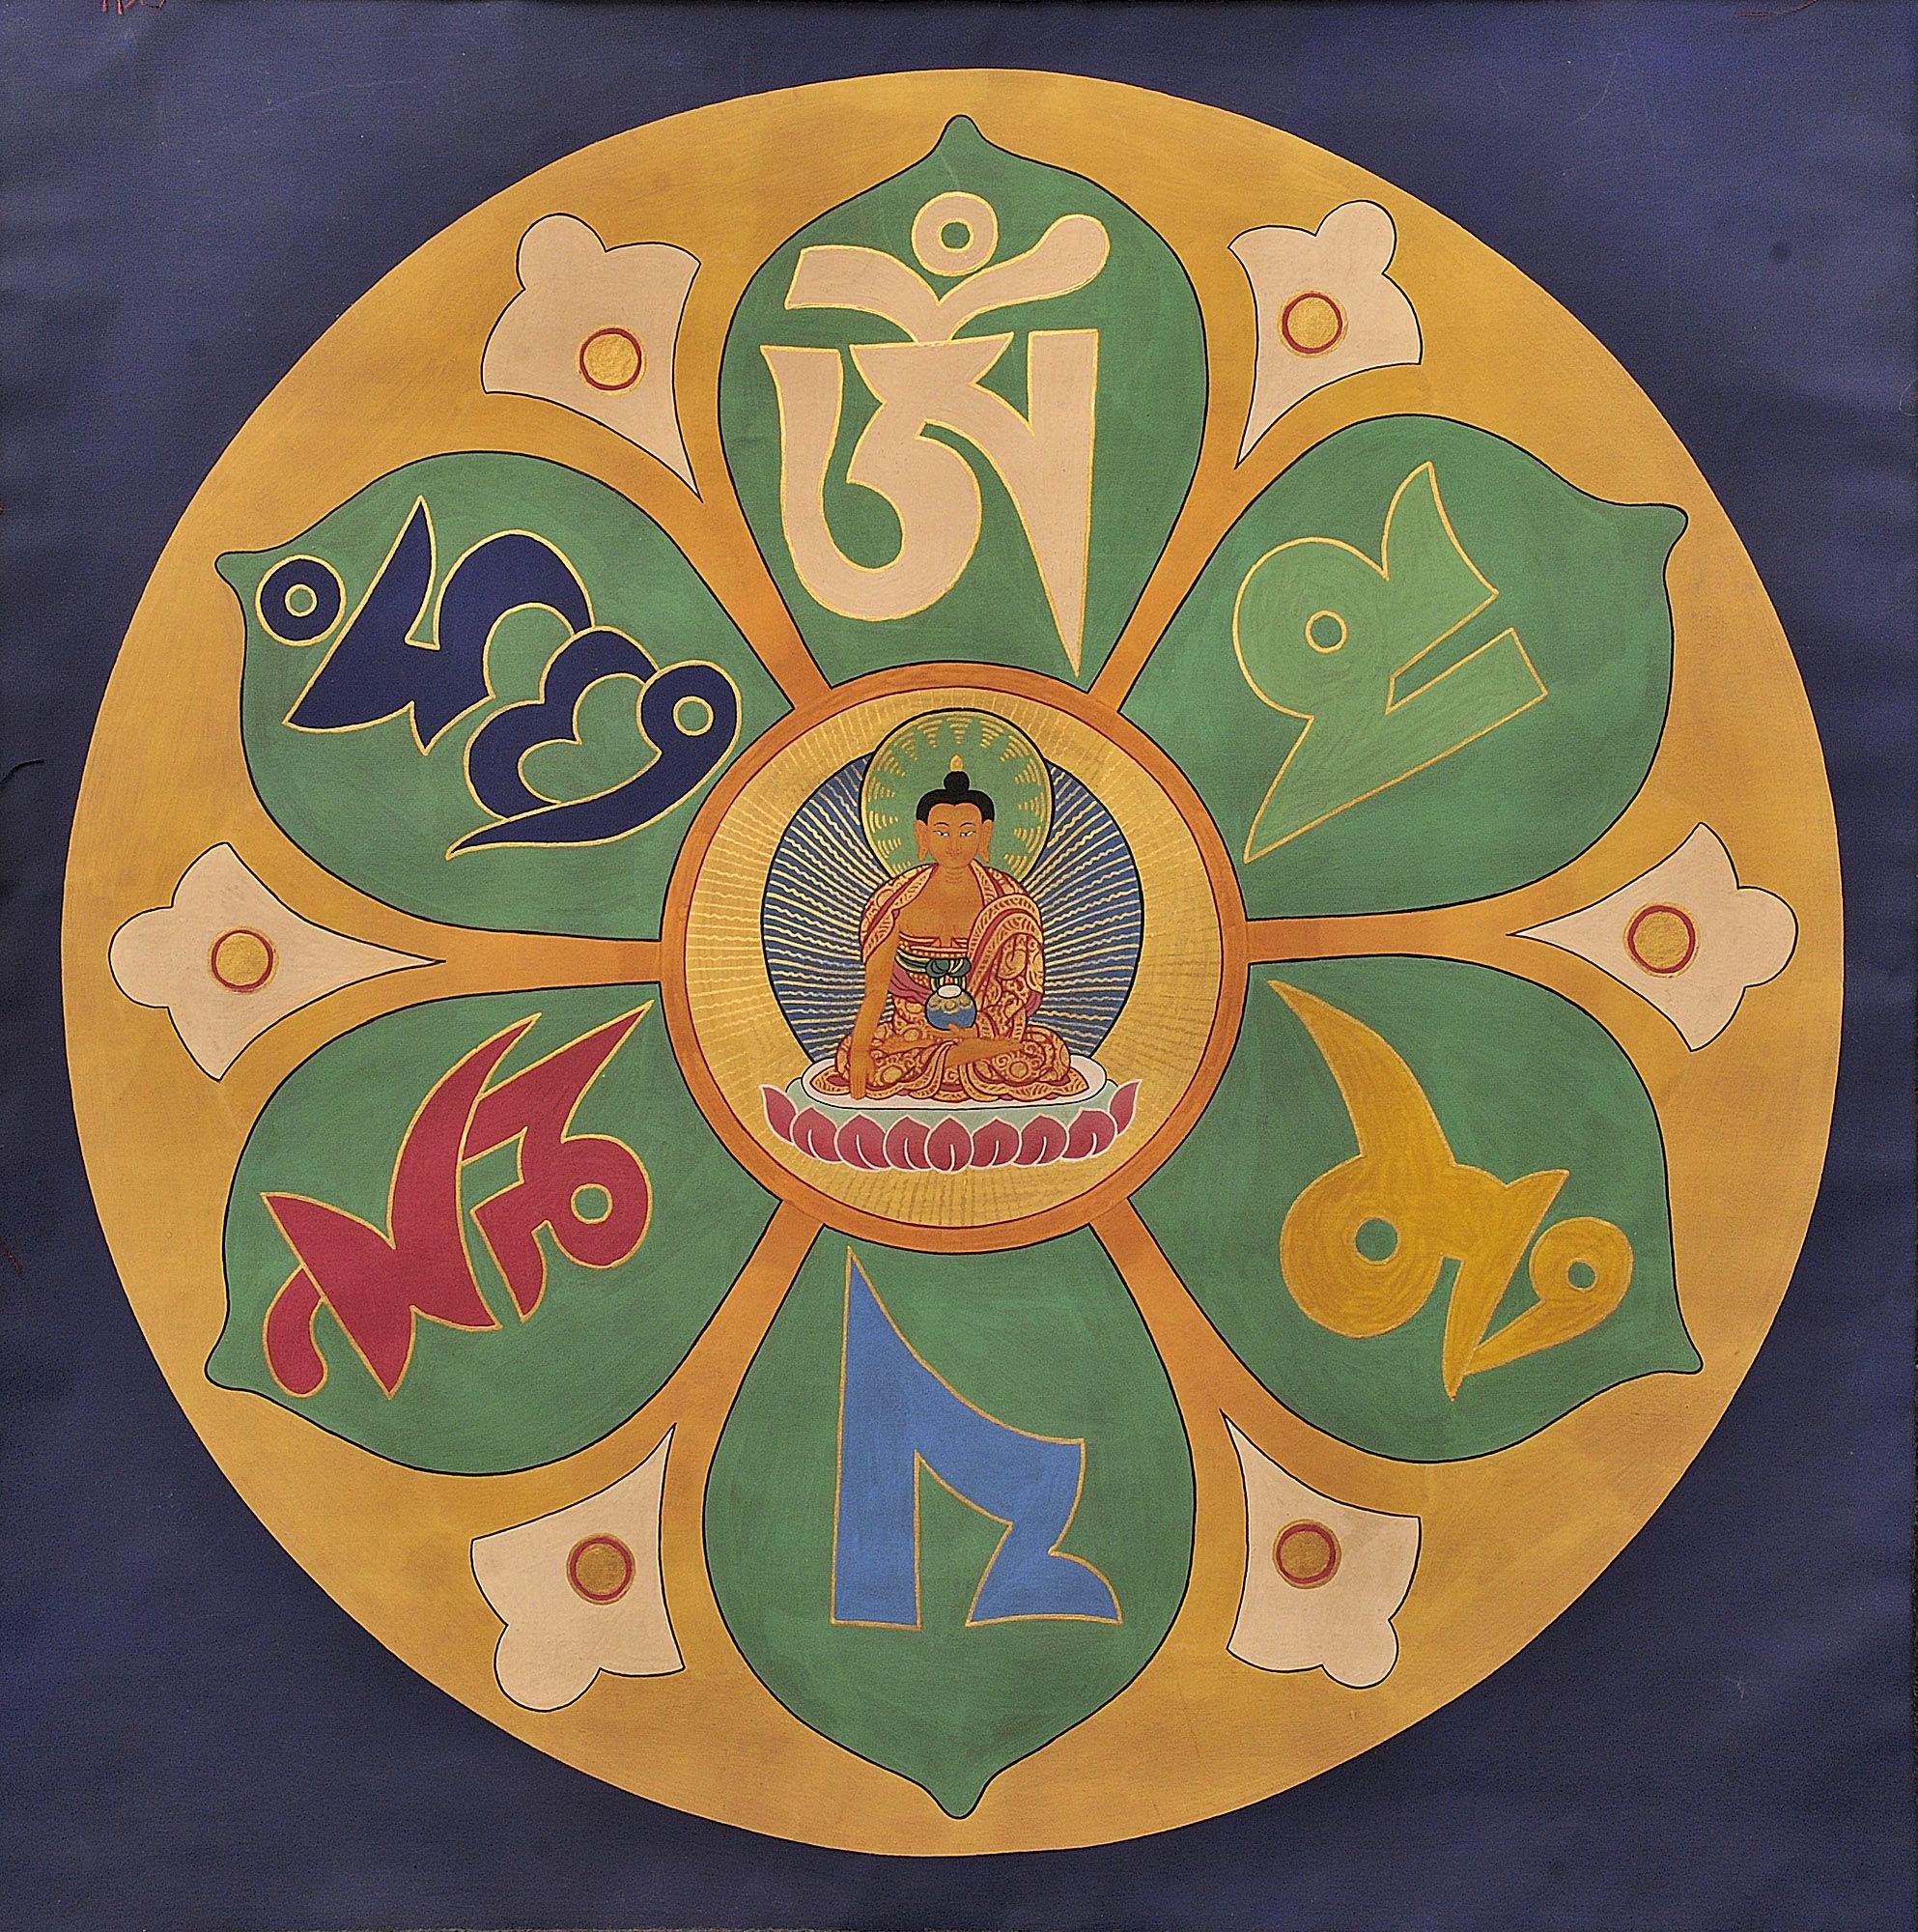 Buy Mandala Thangka Paintings & Other Indian Art At